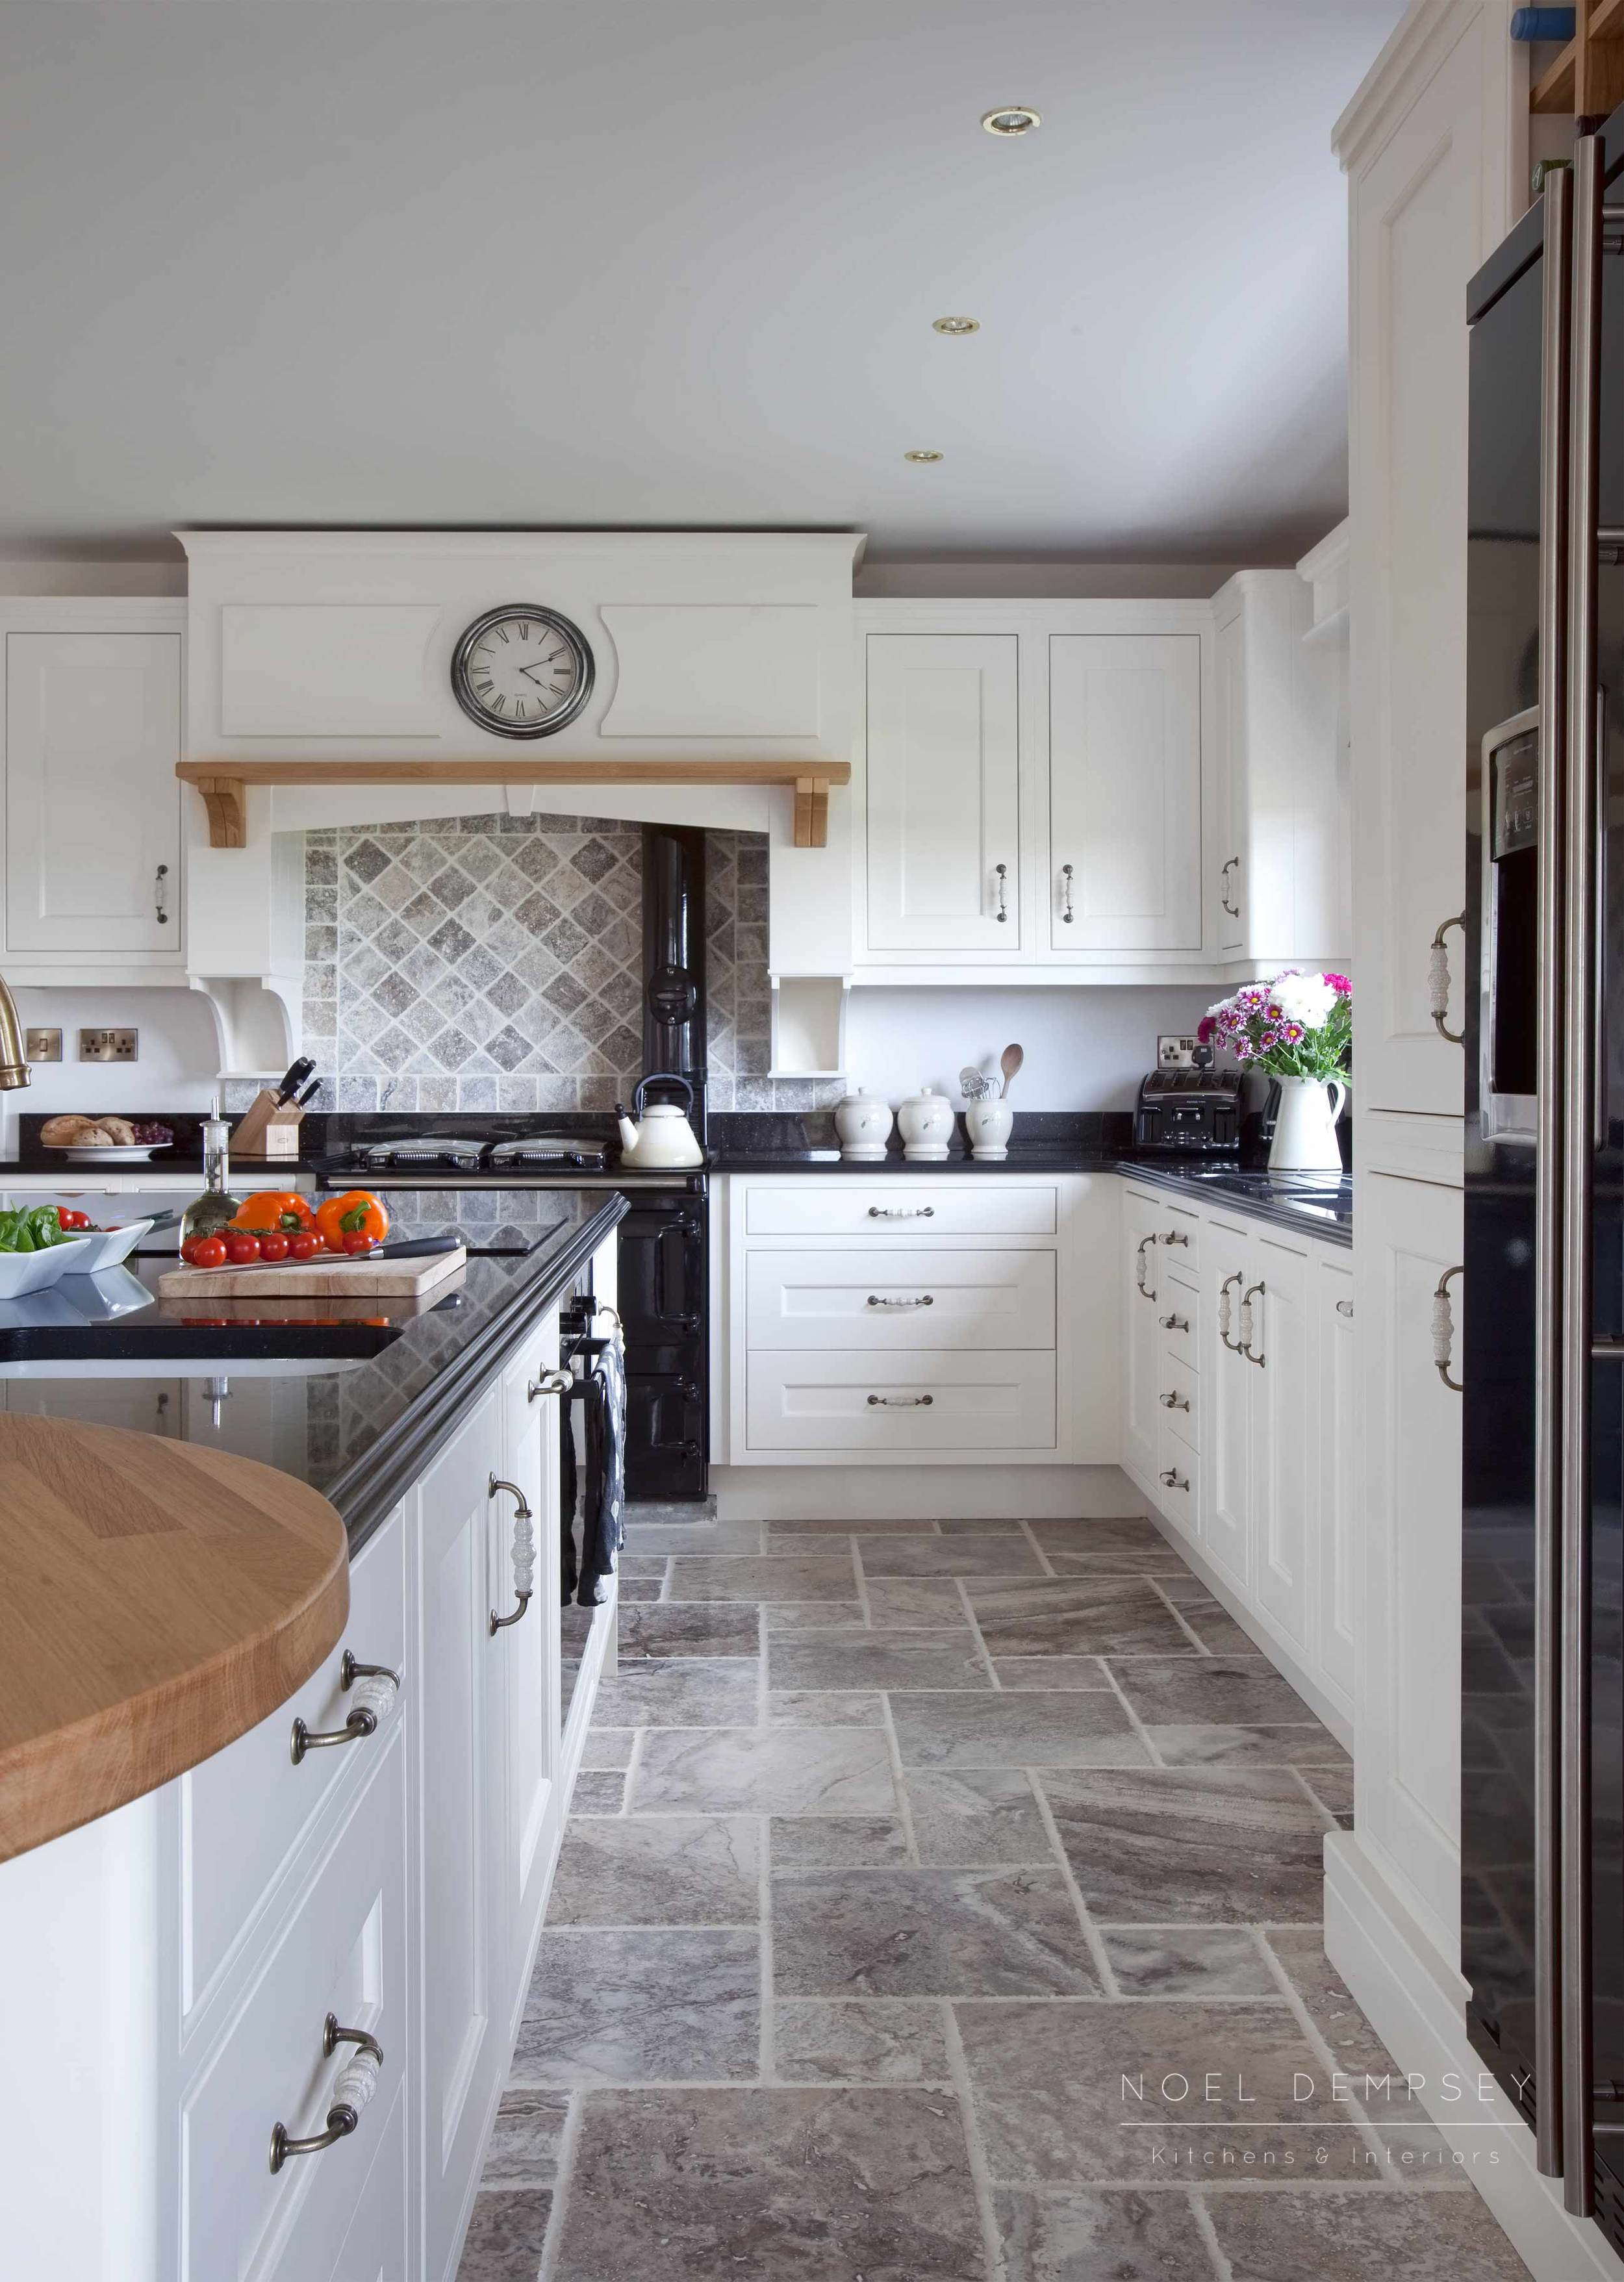 Fox-lane-inframe-hand-painted-kitchens-2.jpg